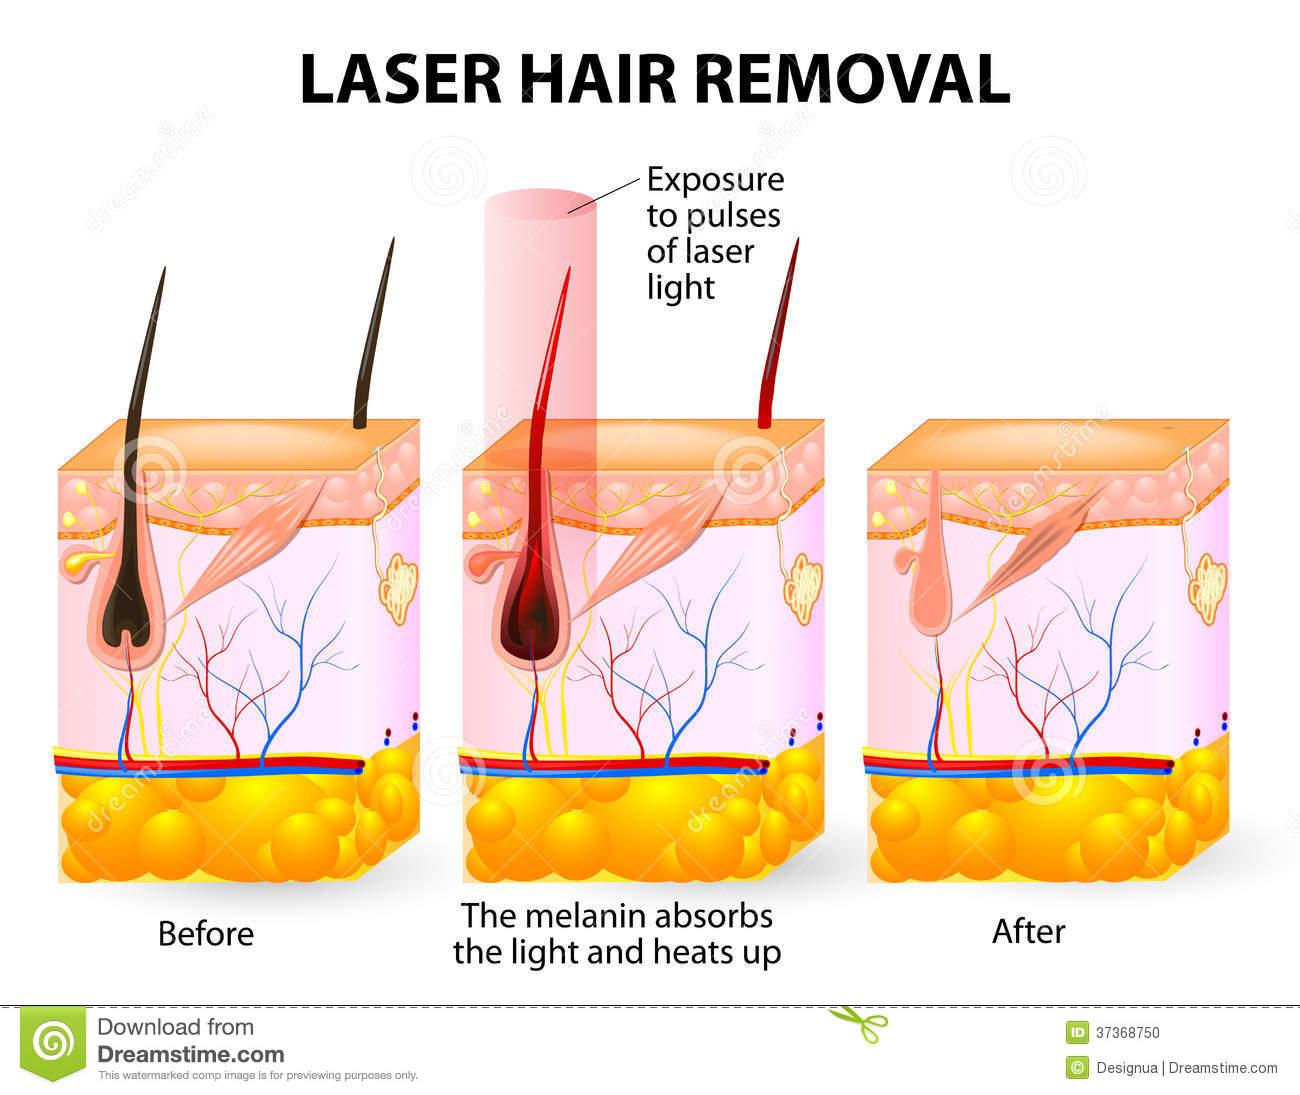 Revisi�n: Cl�nica de pulso l�ser, depilaci�n en tonos de piel oscuros